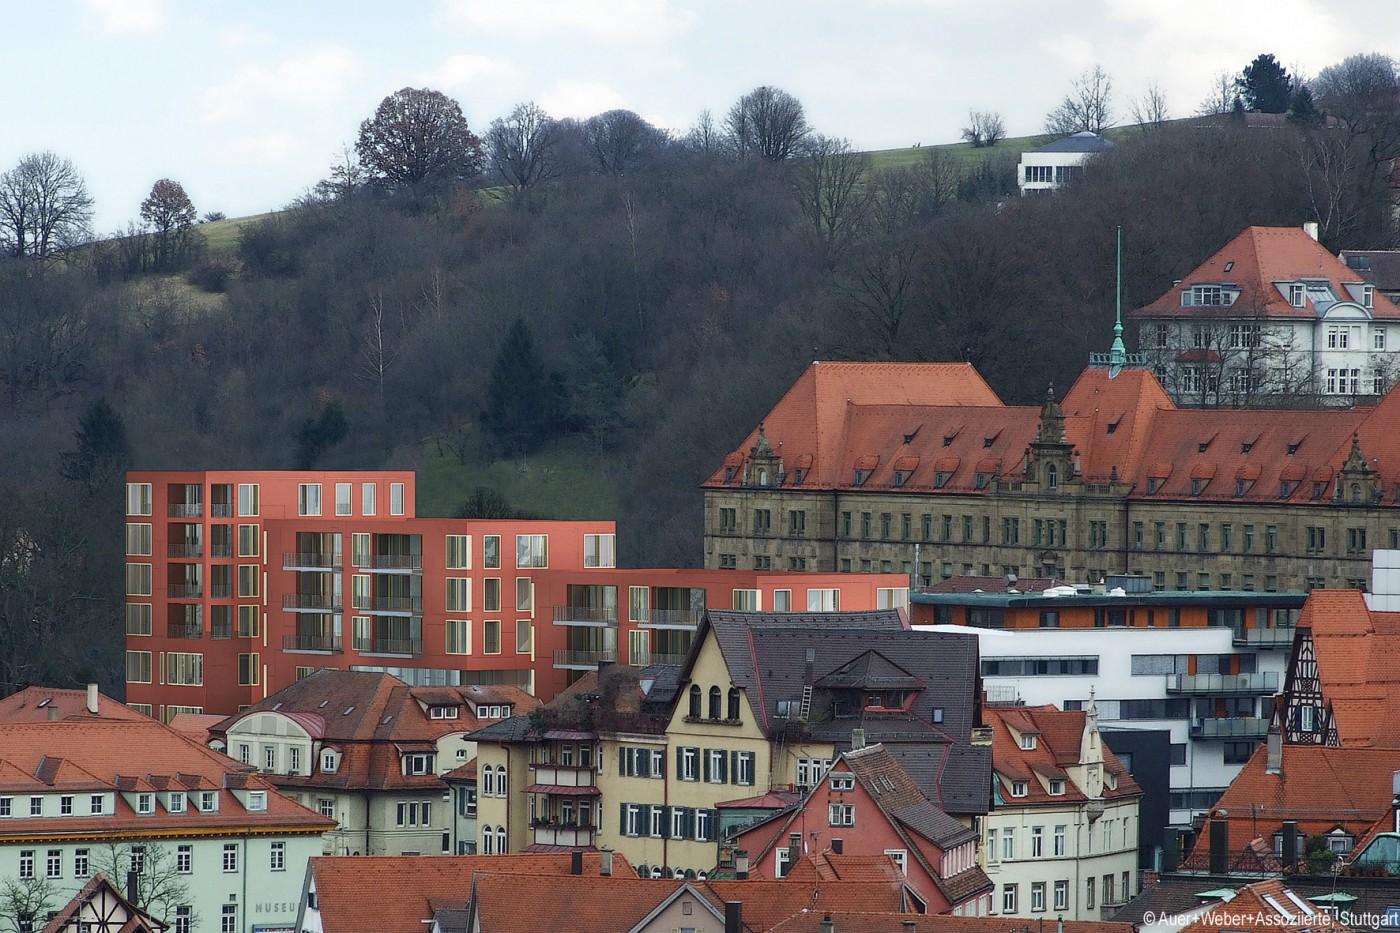 dot_Doblerstrasse_Tuebingen_bild_02_copyright Auer Weber Assoziierte.1400x0